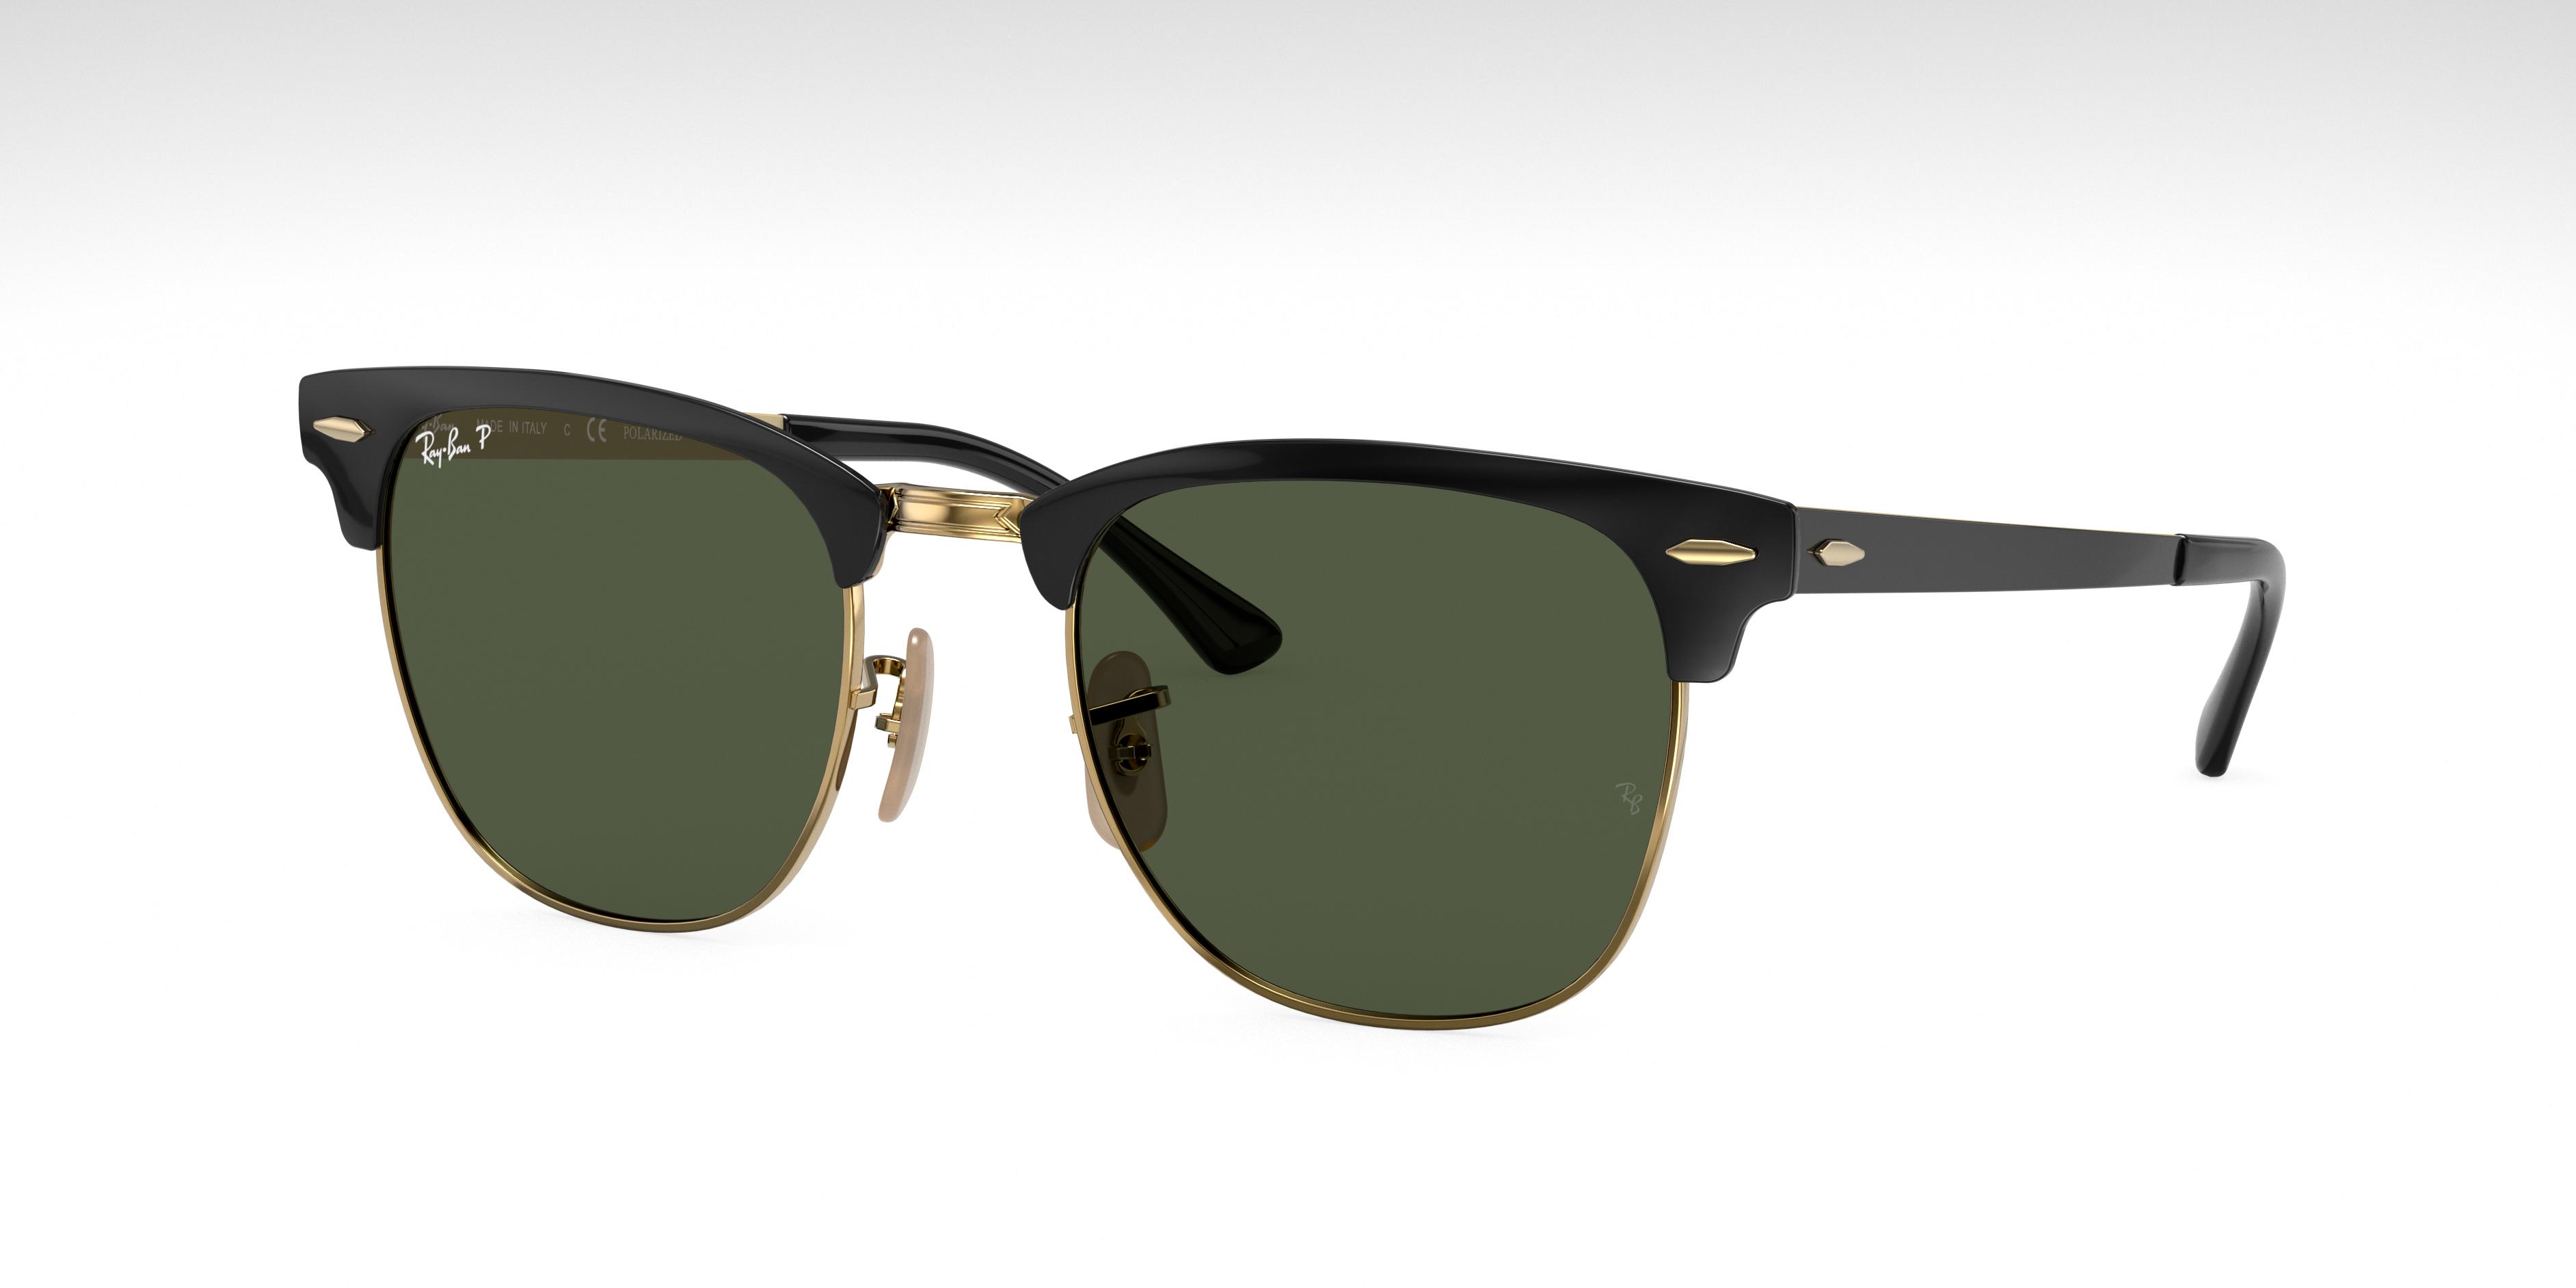 Ray-Ban Clubmaster Metal Black, Polarized Green Lenses - RB3716